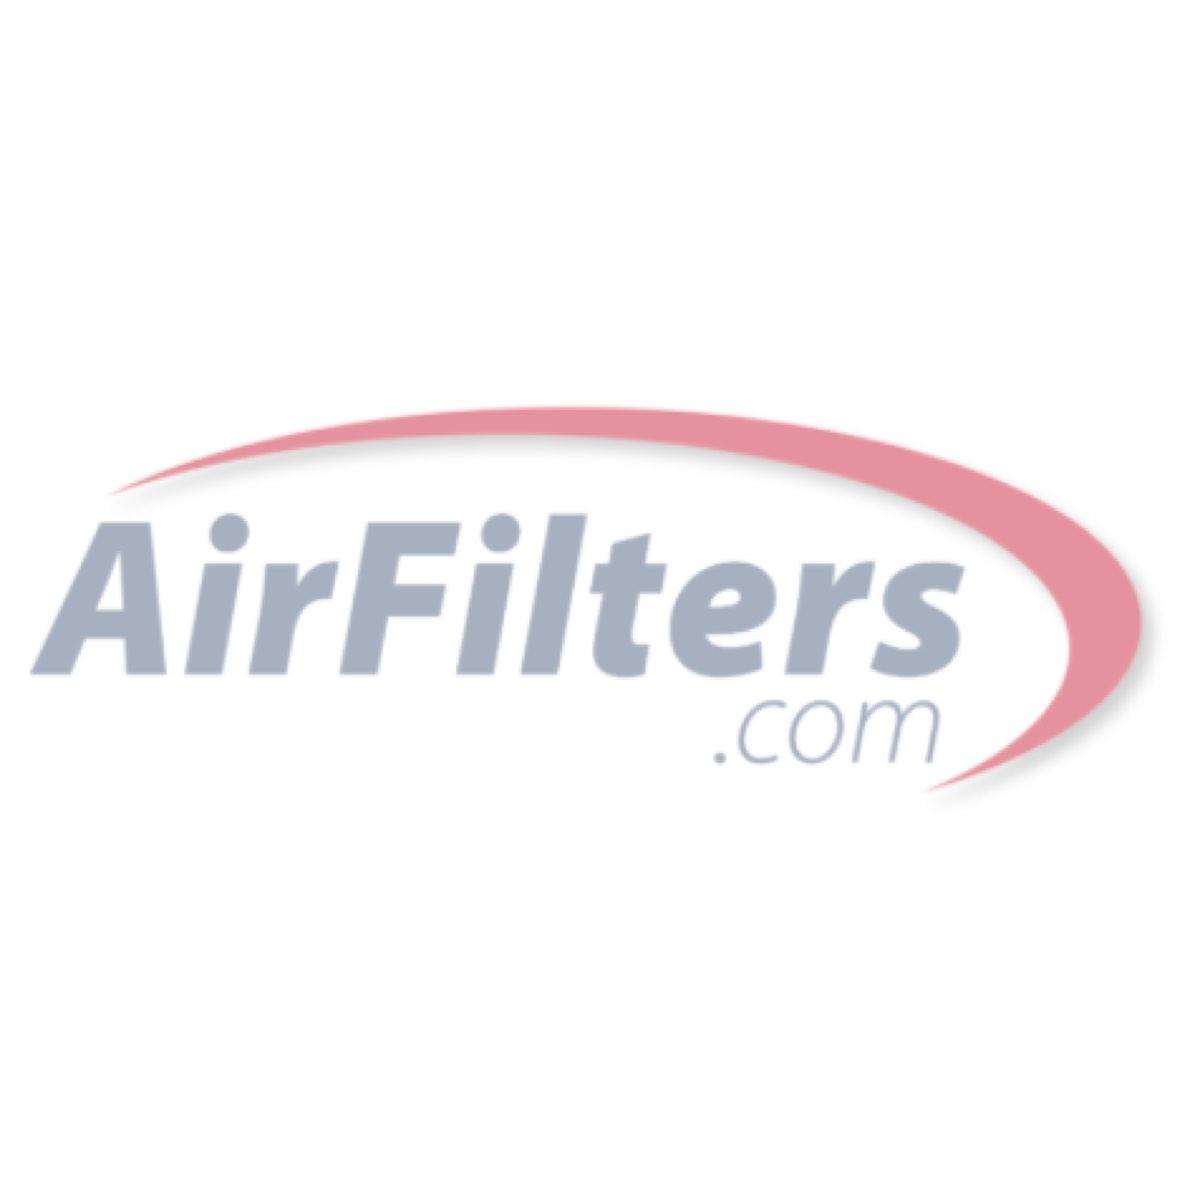 Accumulair Diamond MERV 13 Filters - 4 Inch